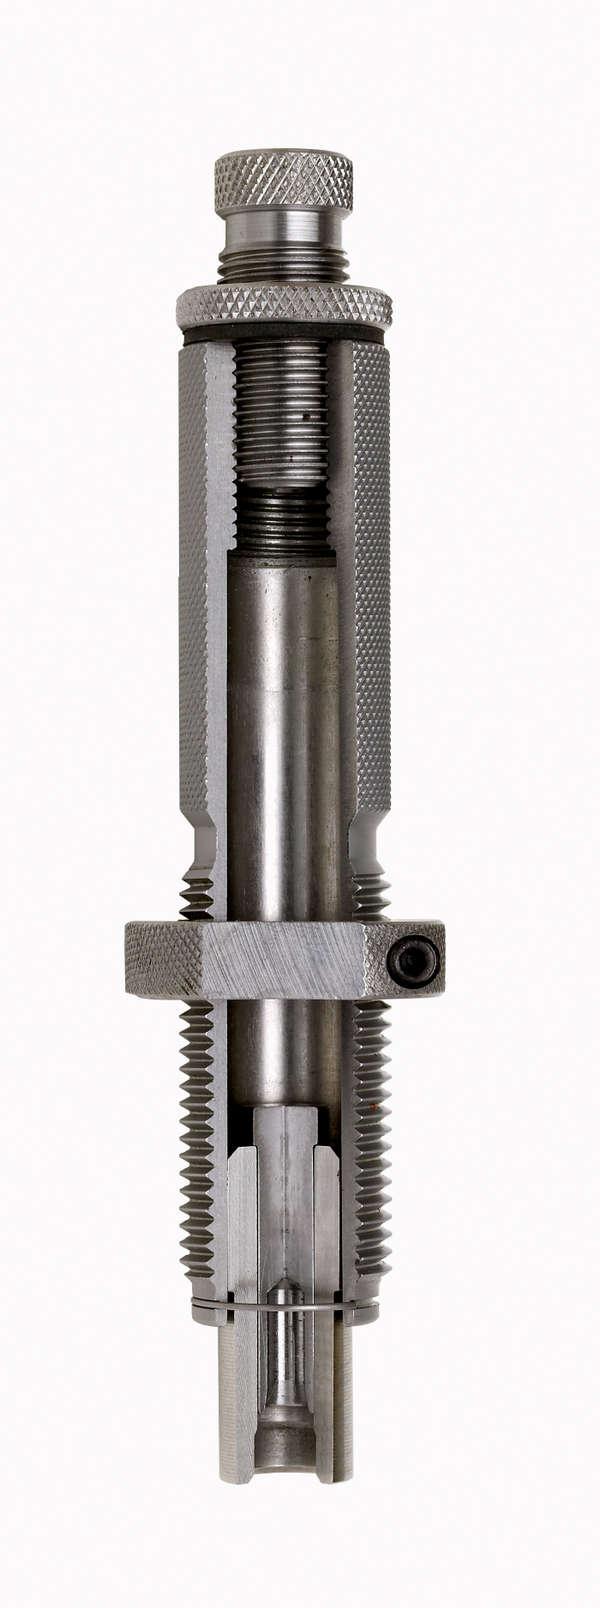 Custom Grade™ Dies - Hornady Manufacturing, Inc